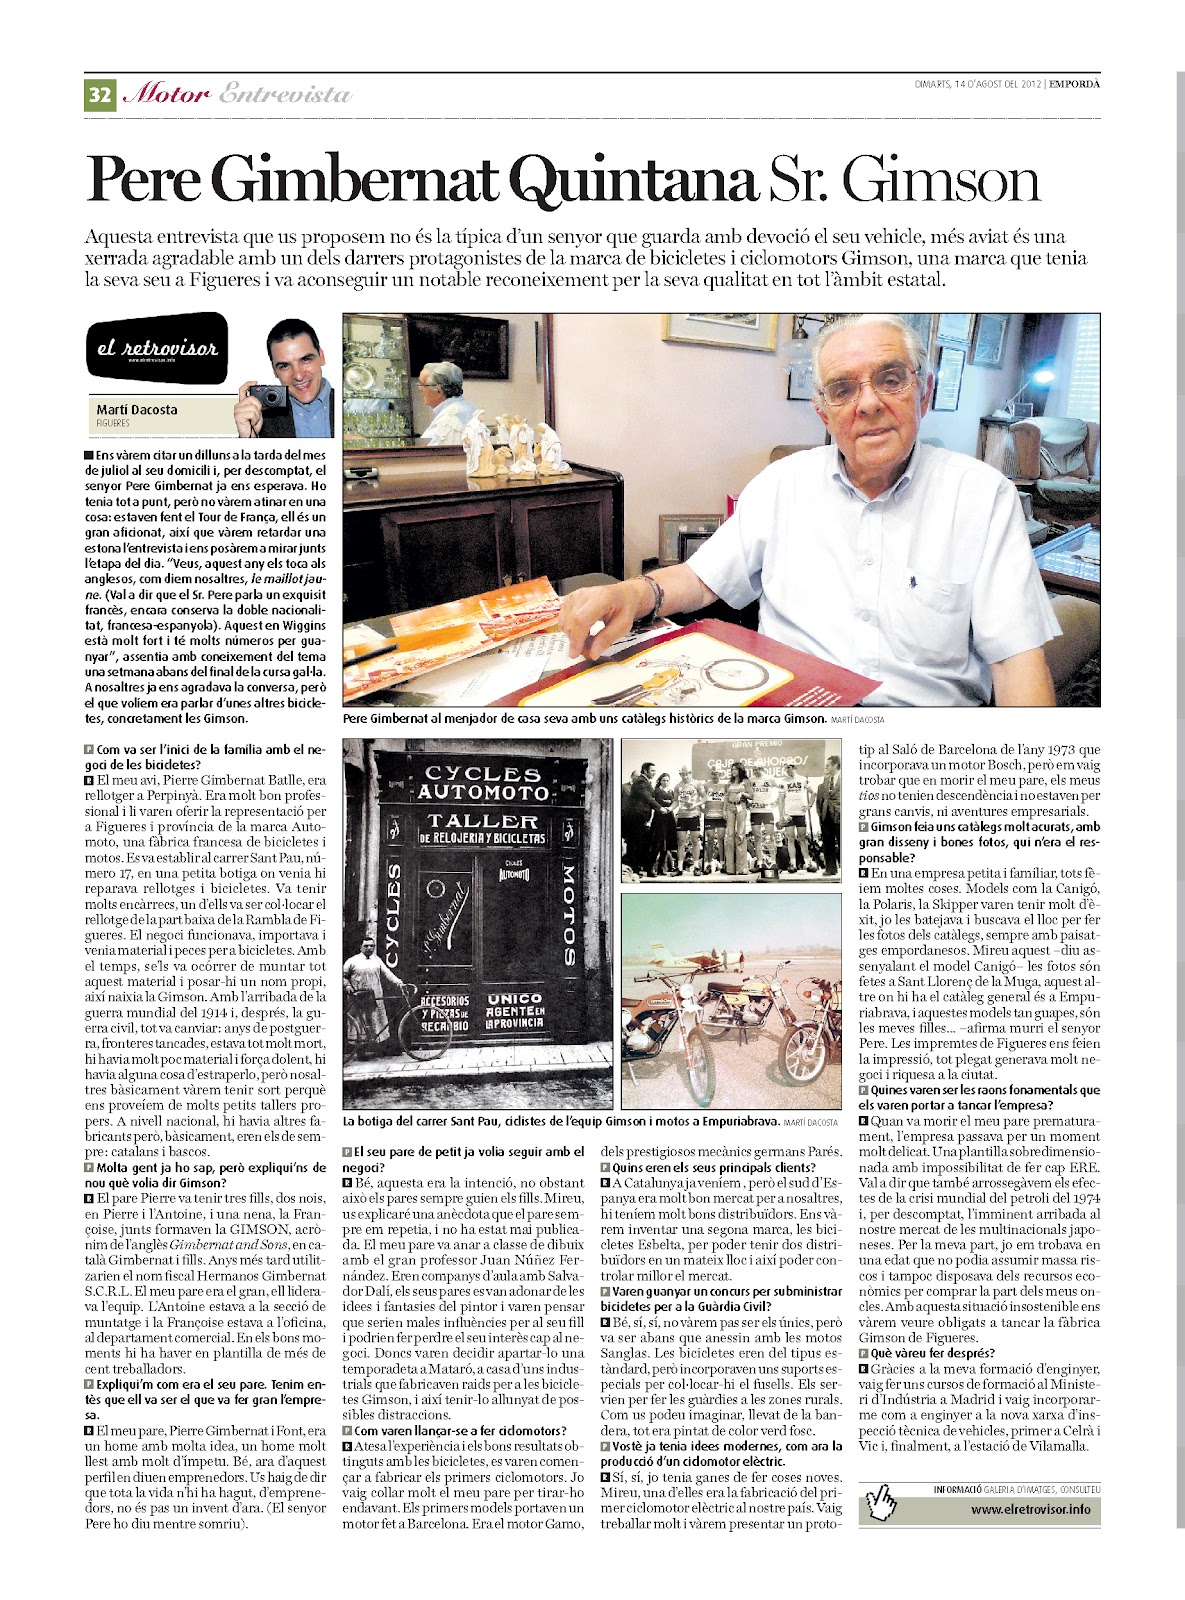 Entrevista a Pere Gimbernat 33jjpd4